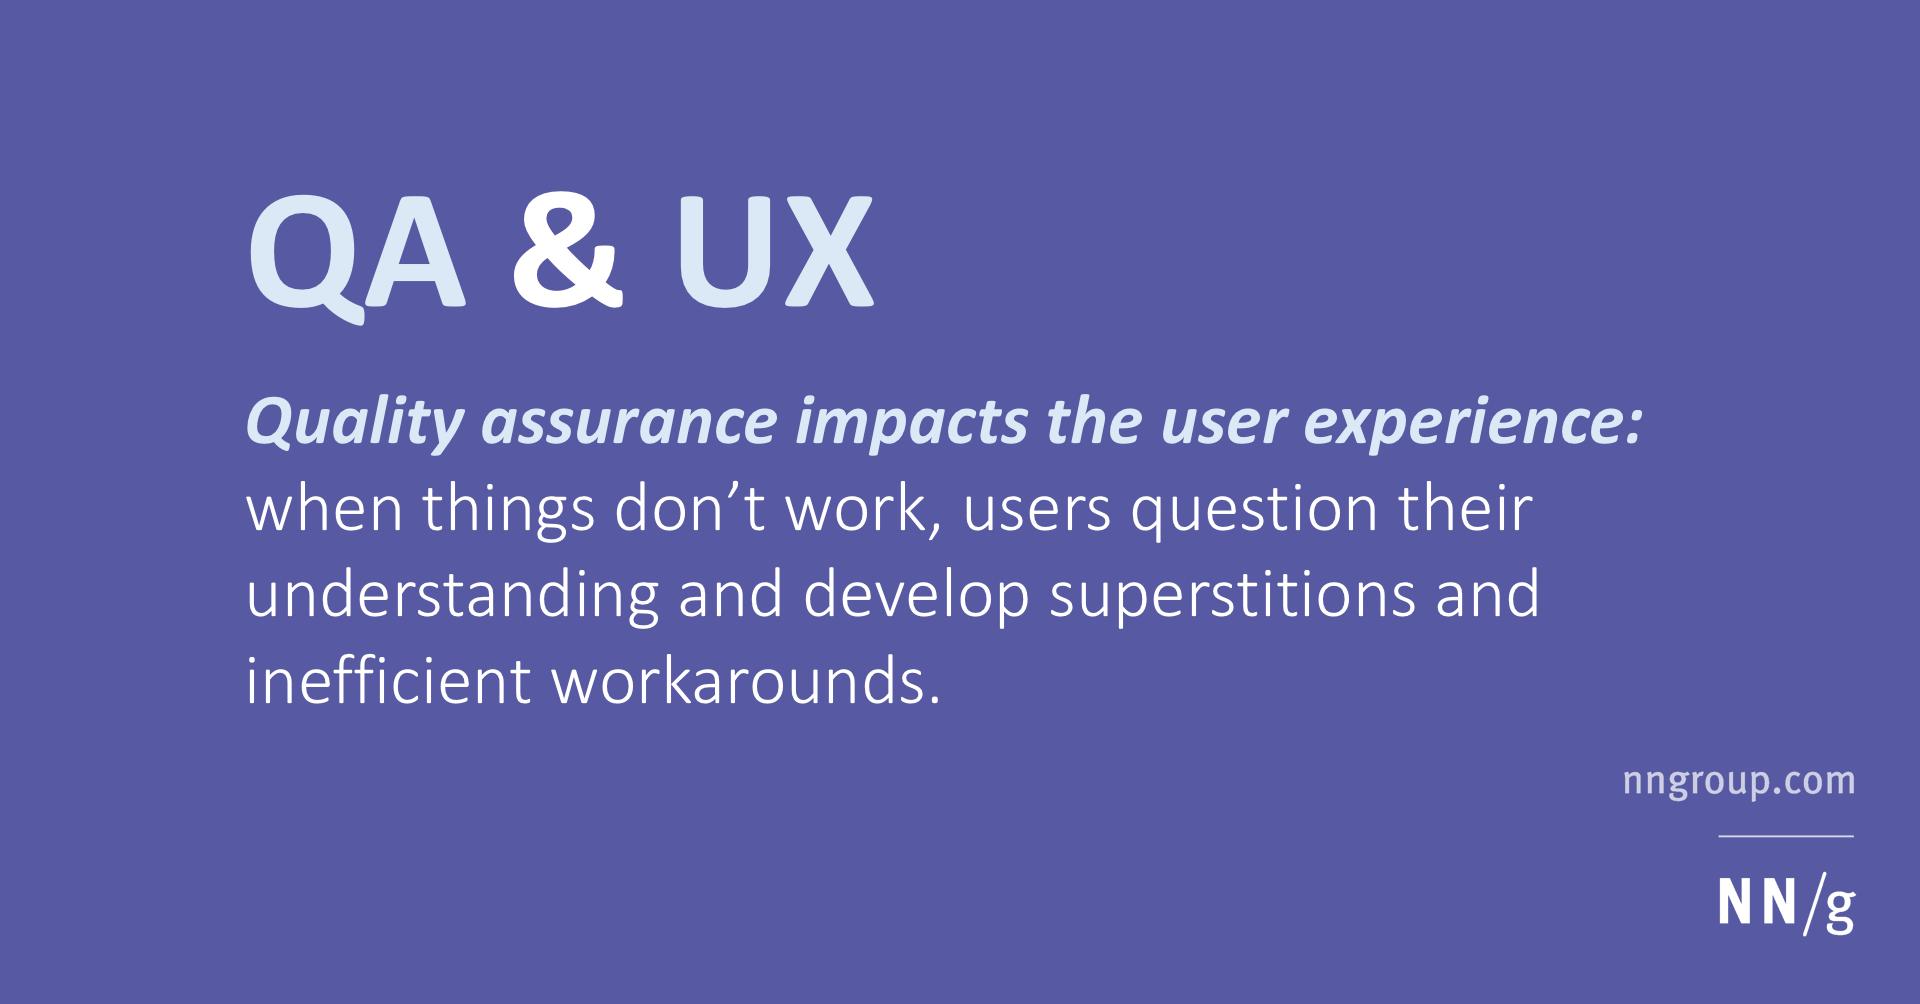 QA (quality assurance) & UX (user experience)